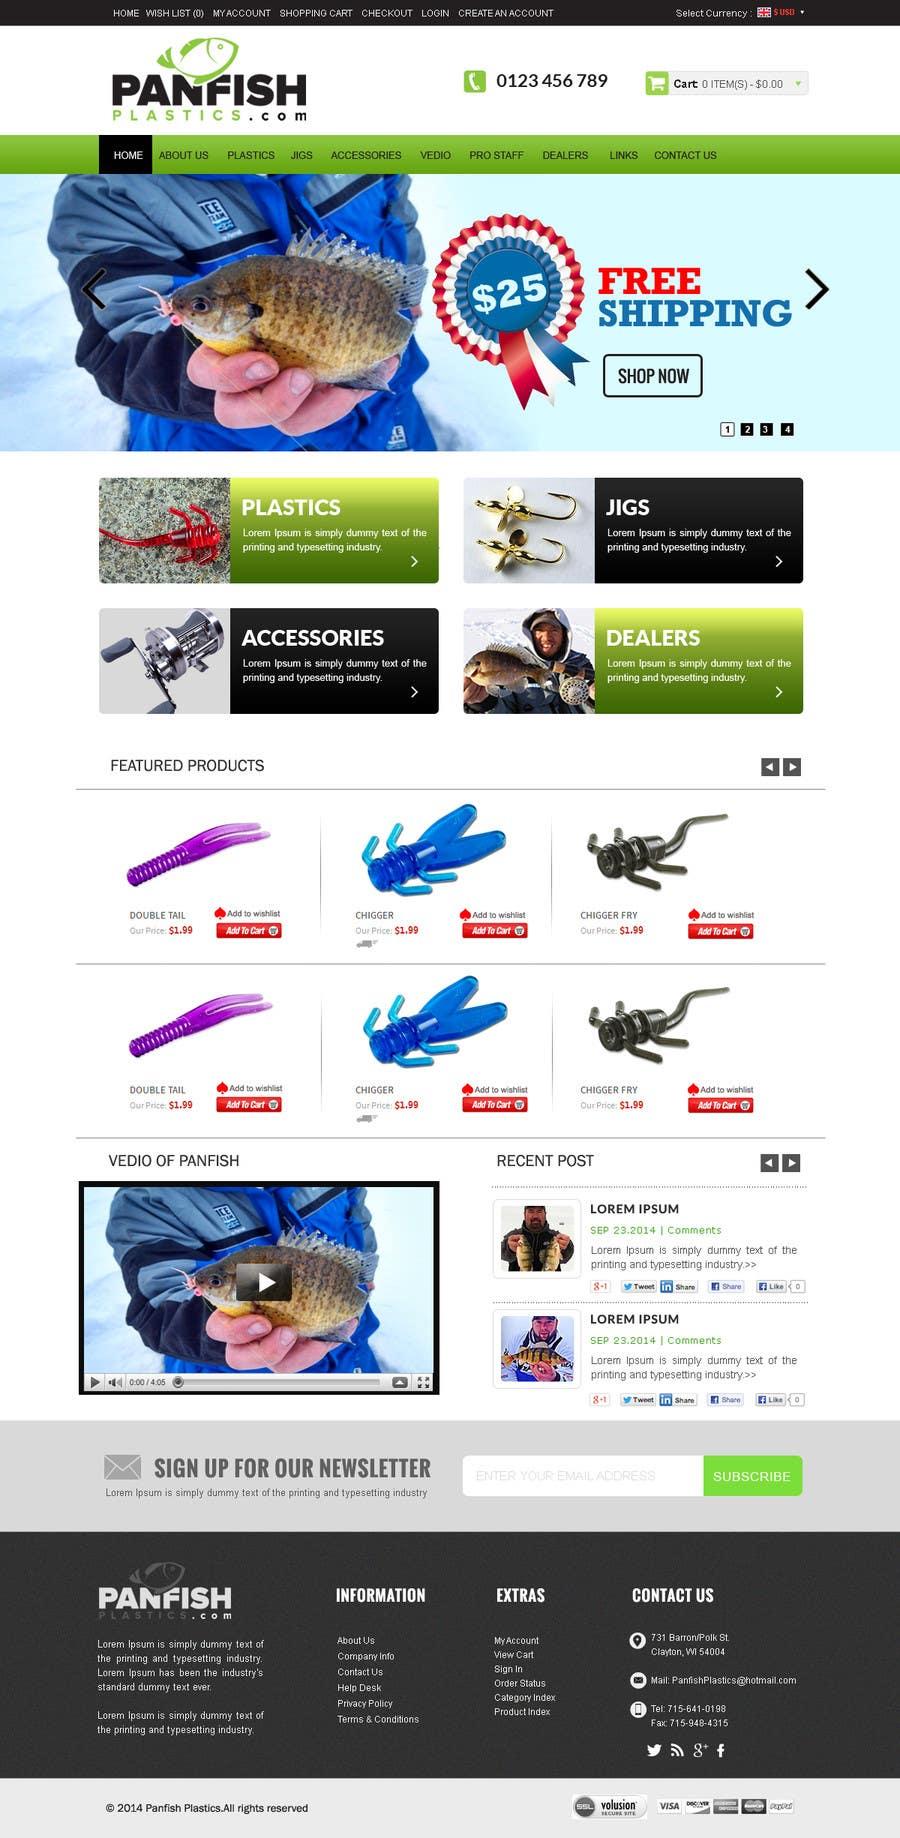 Penyertaan Peraduan #                                        33                                      untuk                                         Design a Website Mockup for ecommerce fishing store